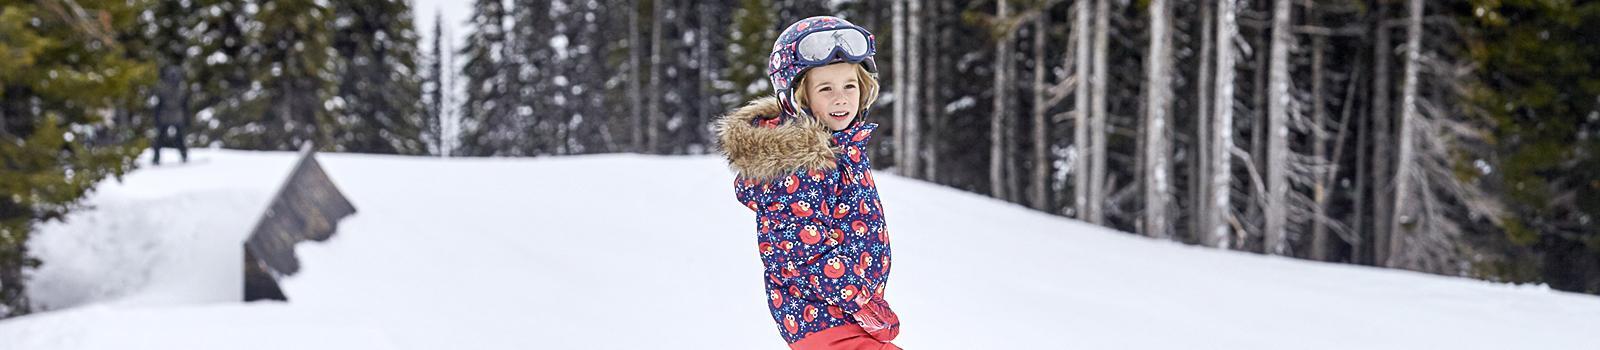 Сноубординг детям